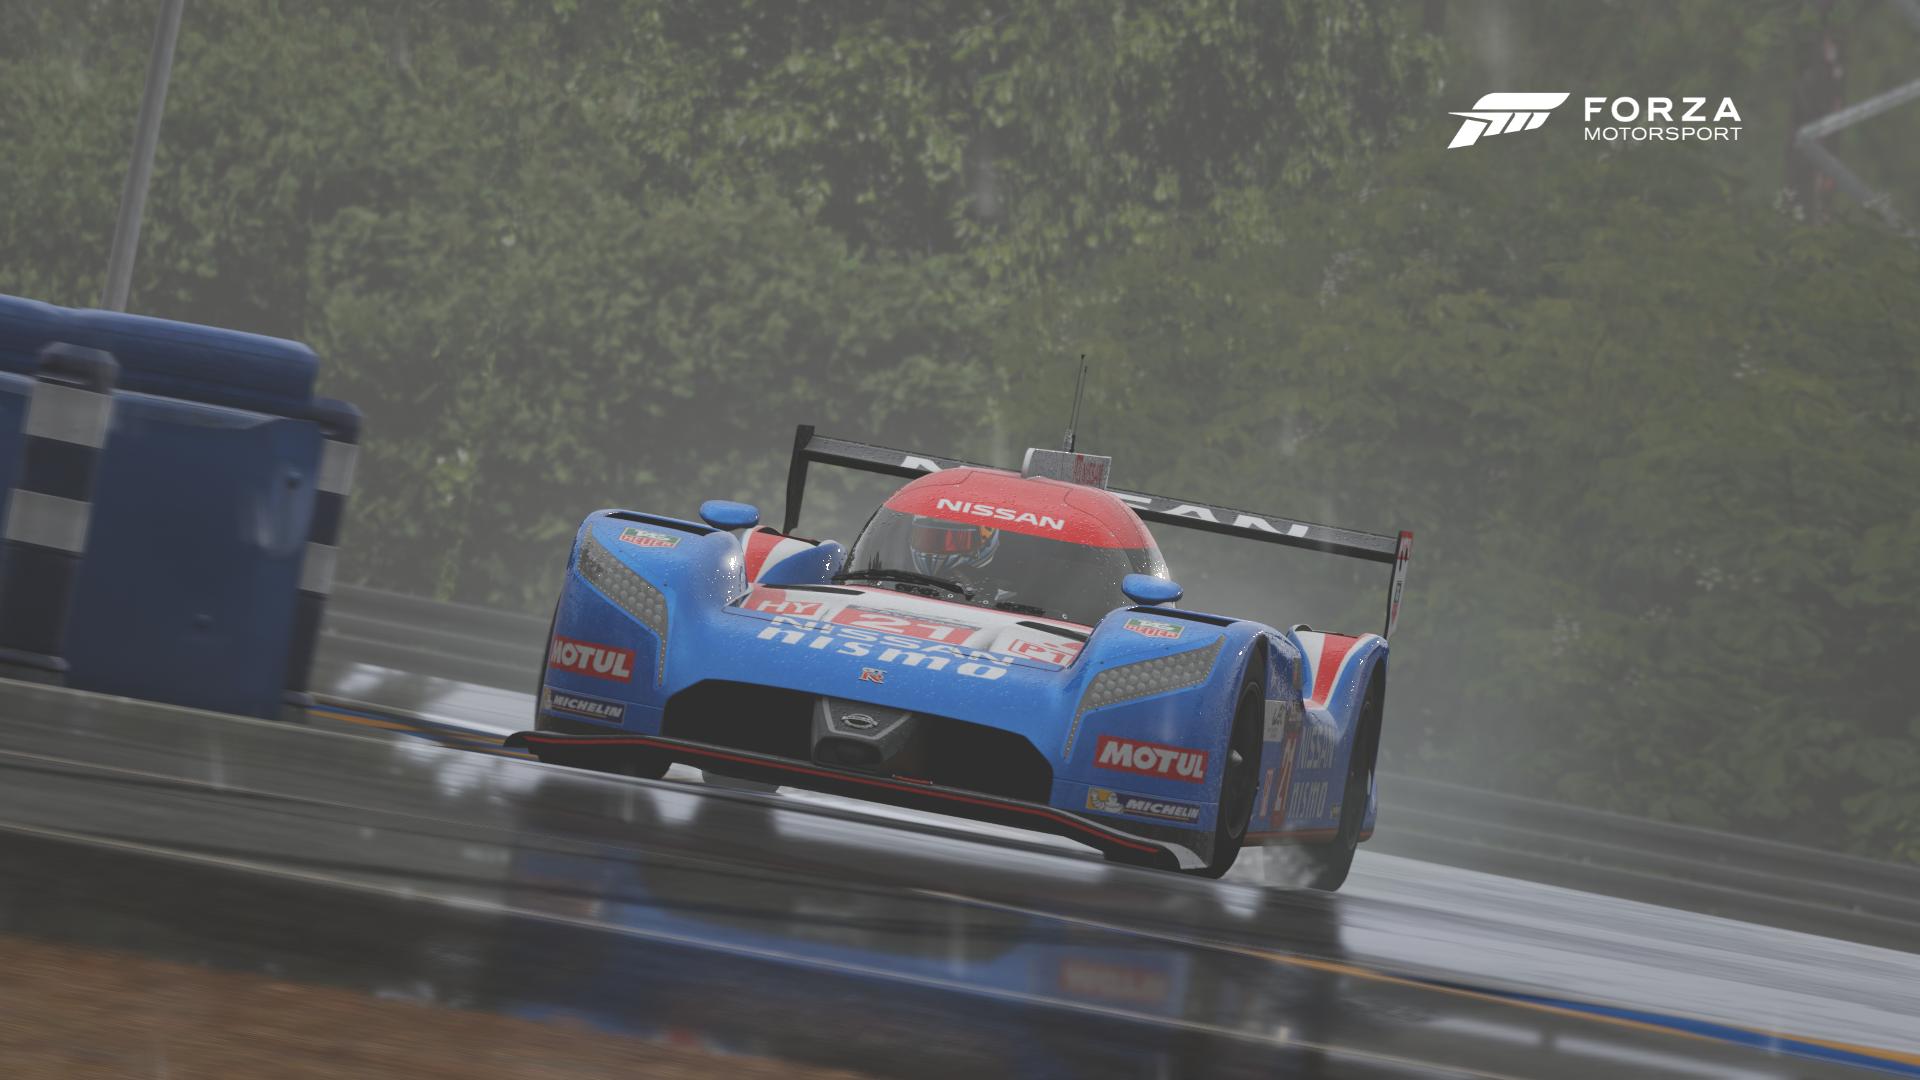 Forza Motorsport 6 (2).png